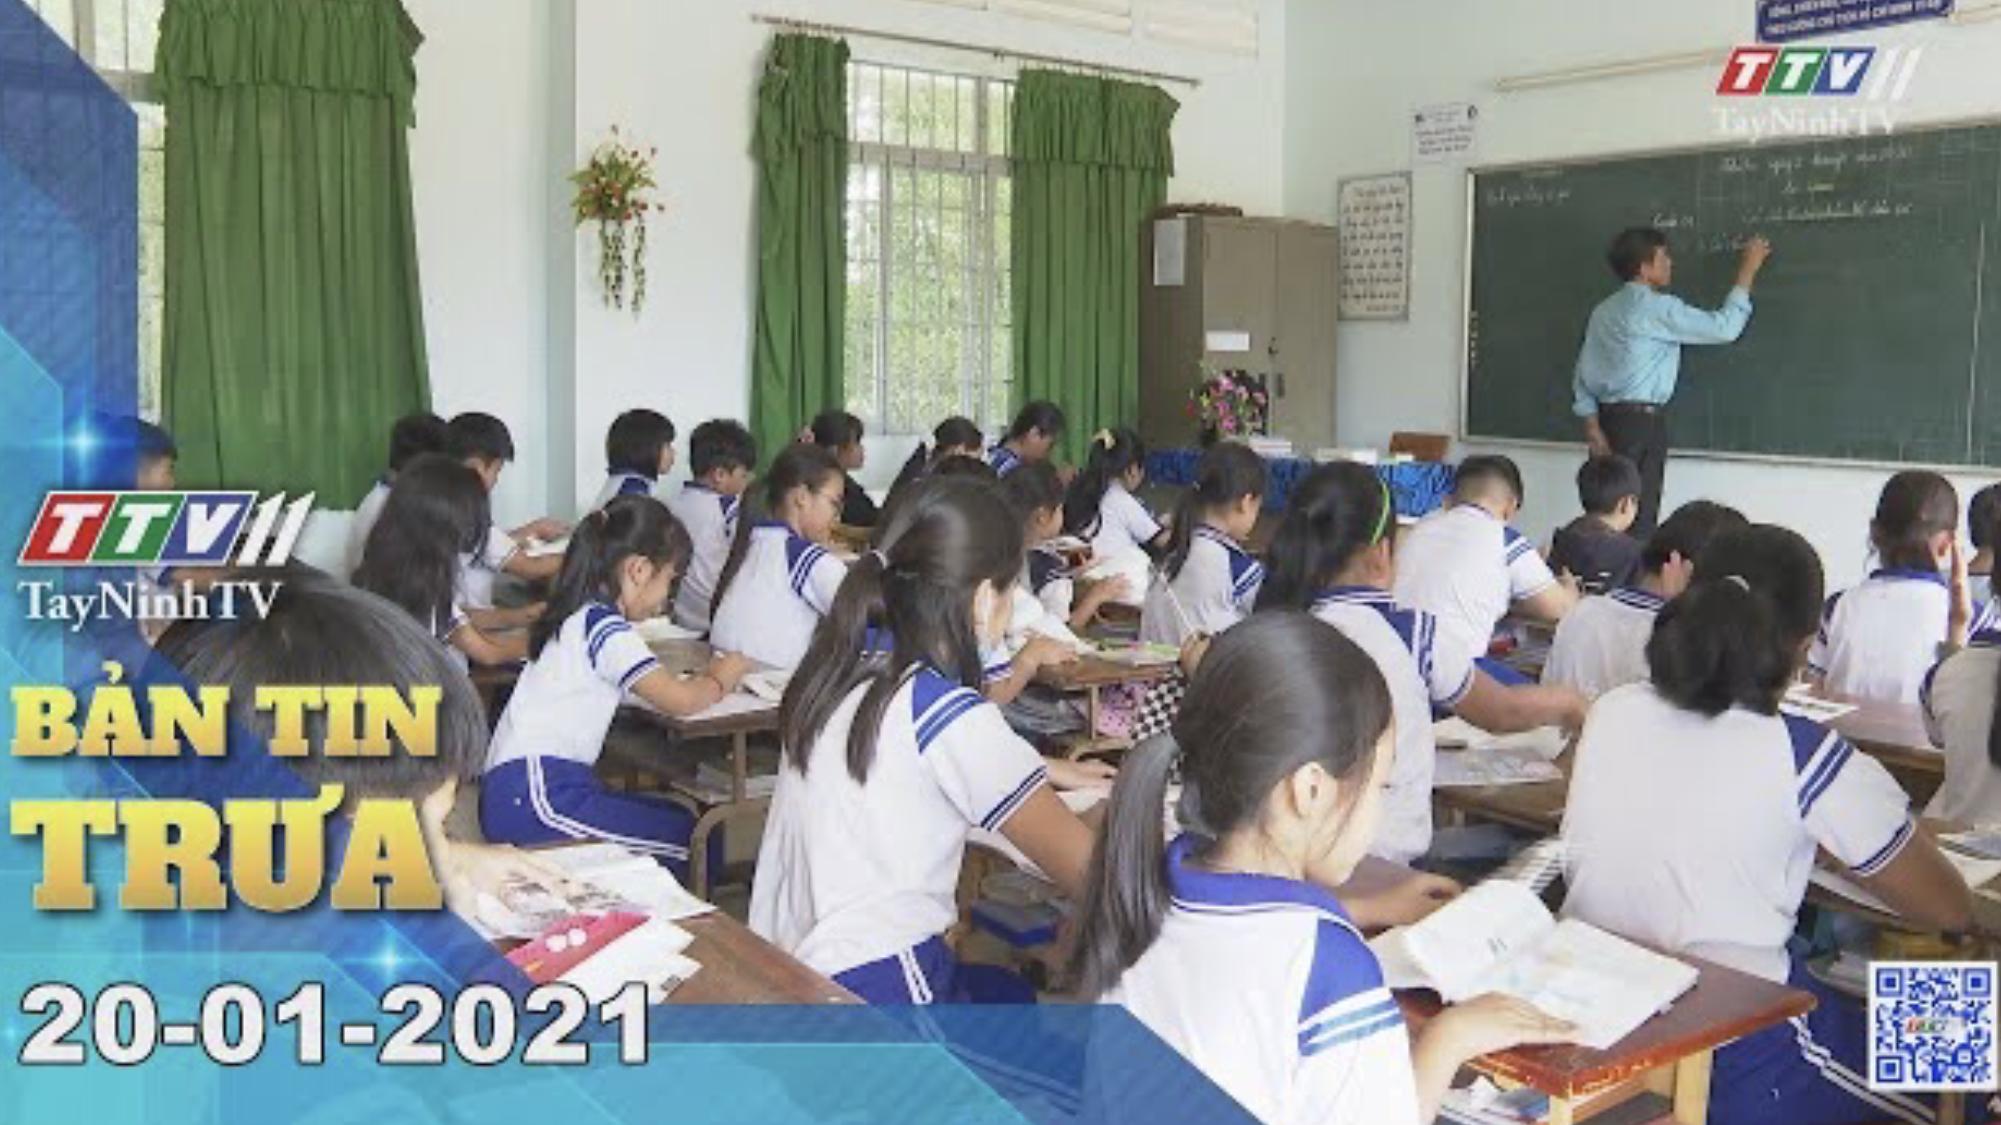 Bản tin trưa 20-01-2021 | Tin tức hôm nay | TayNinhTV